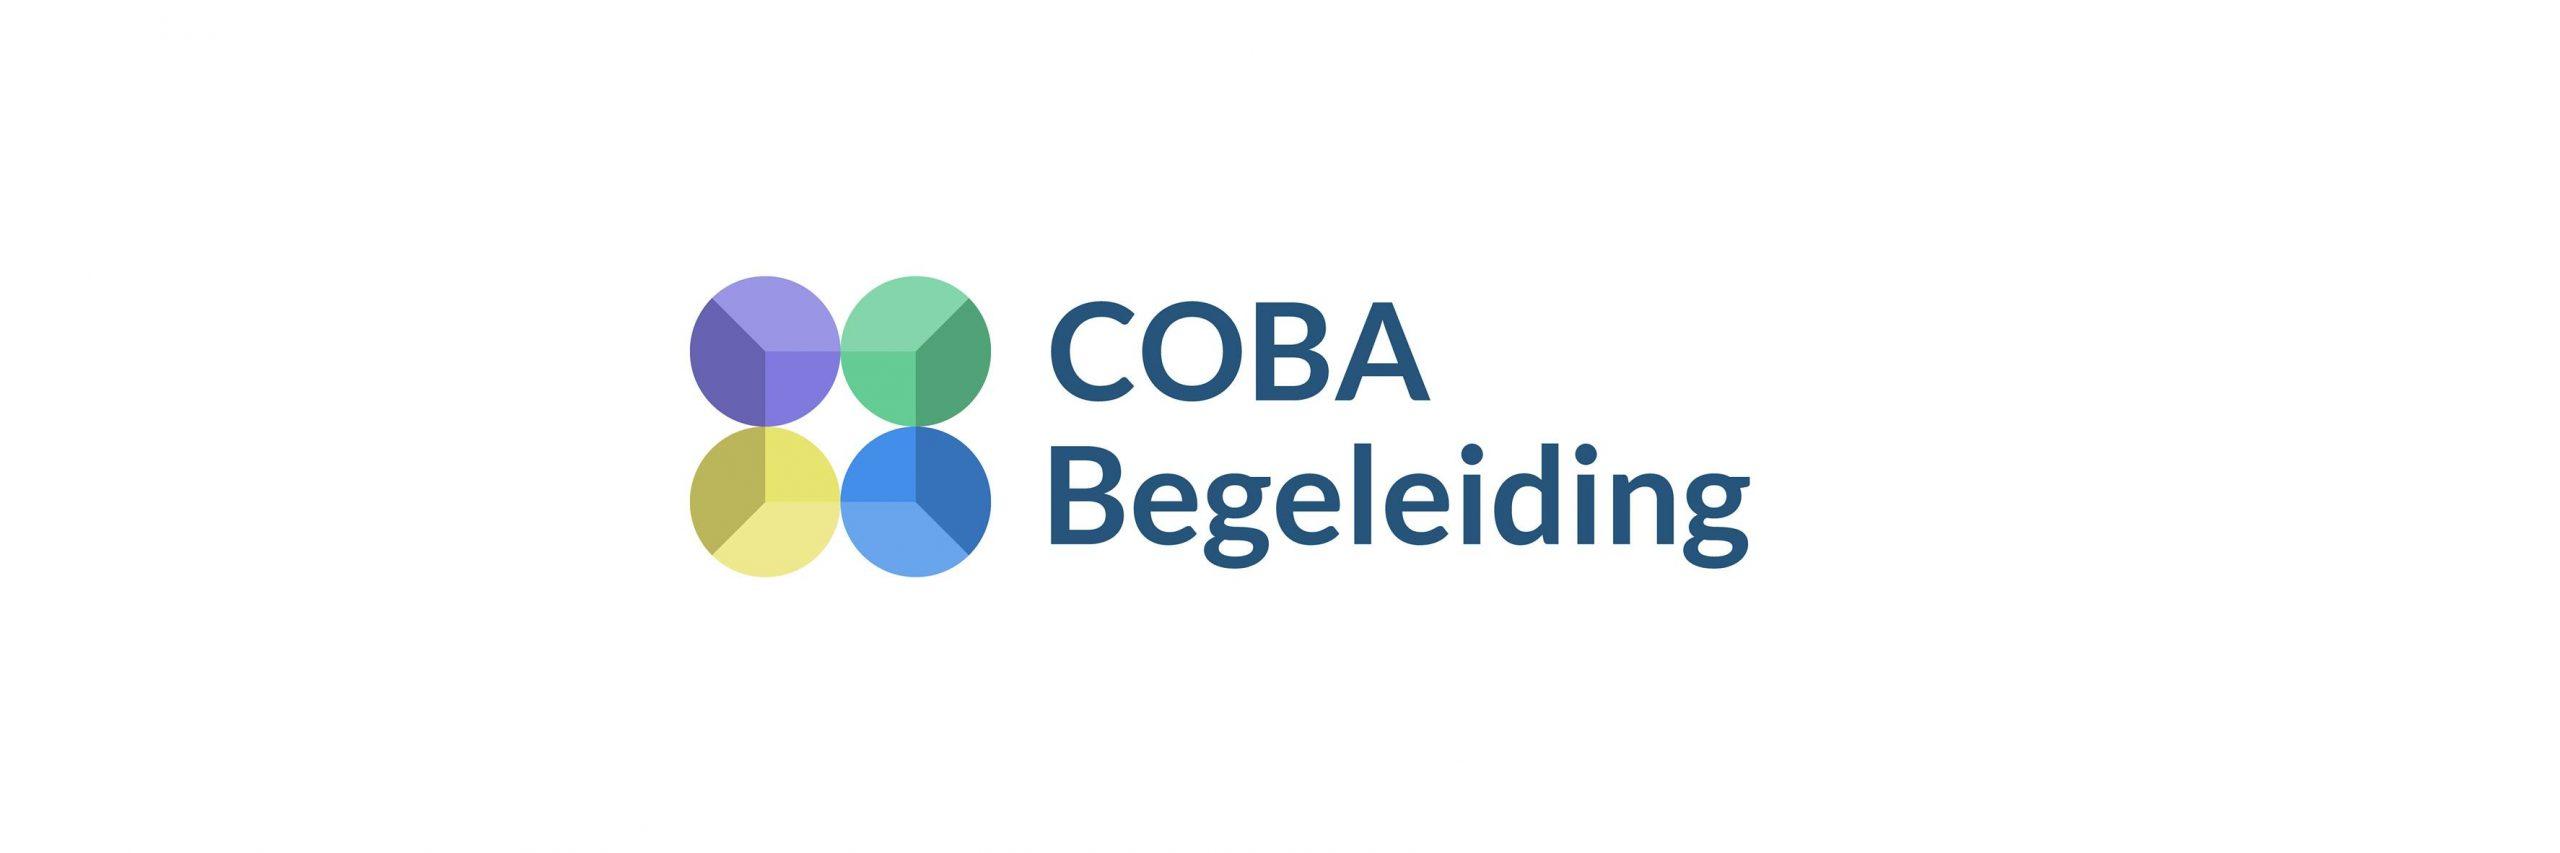 COBA-Begeleiding